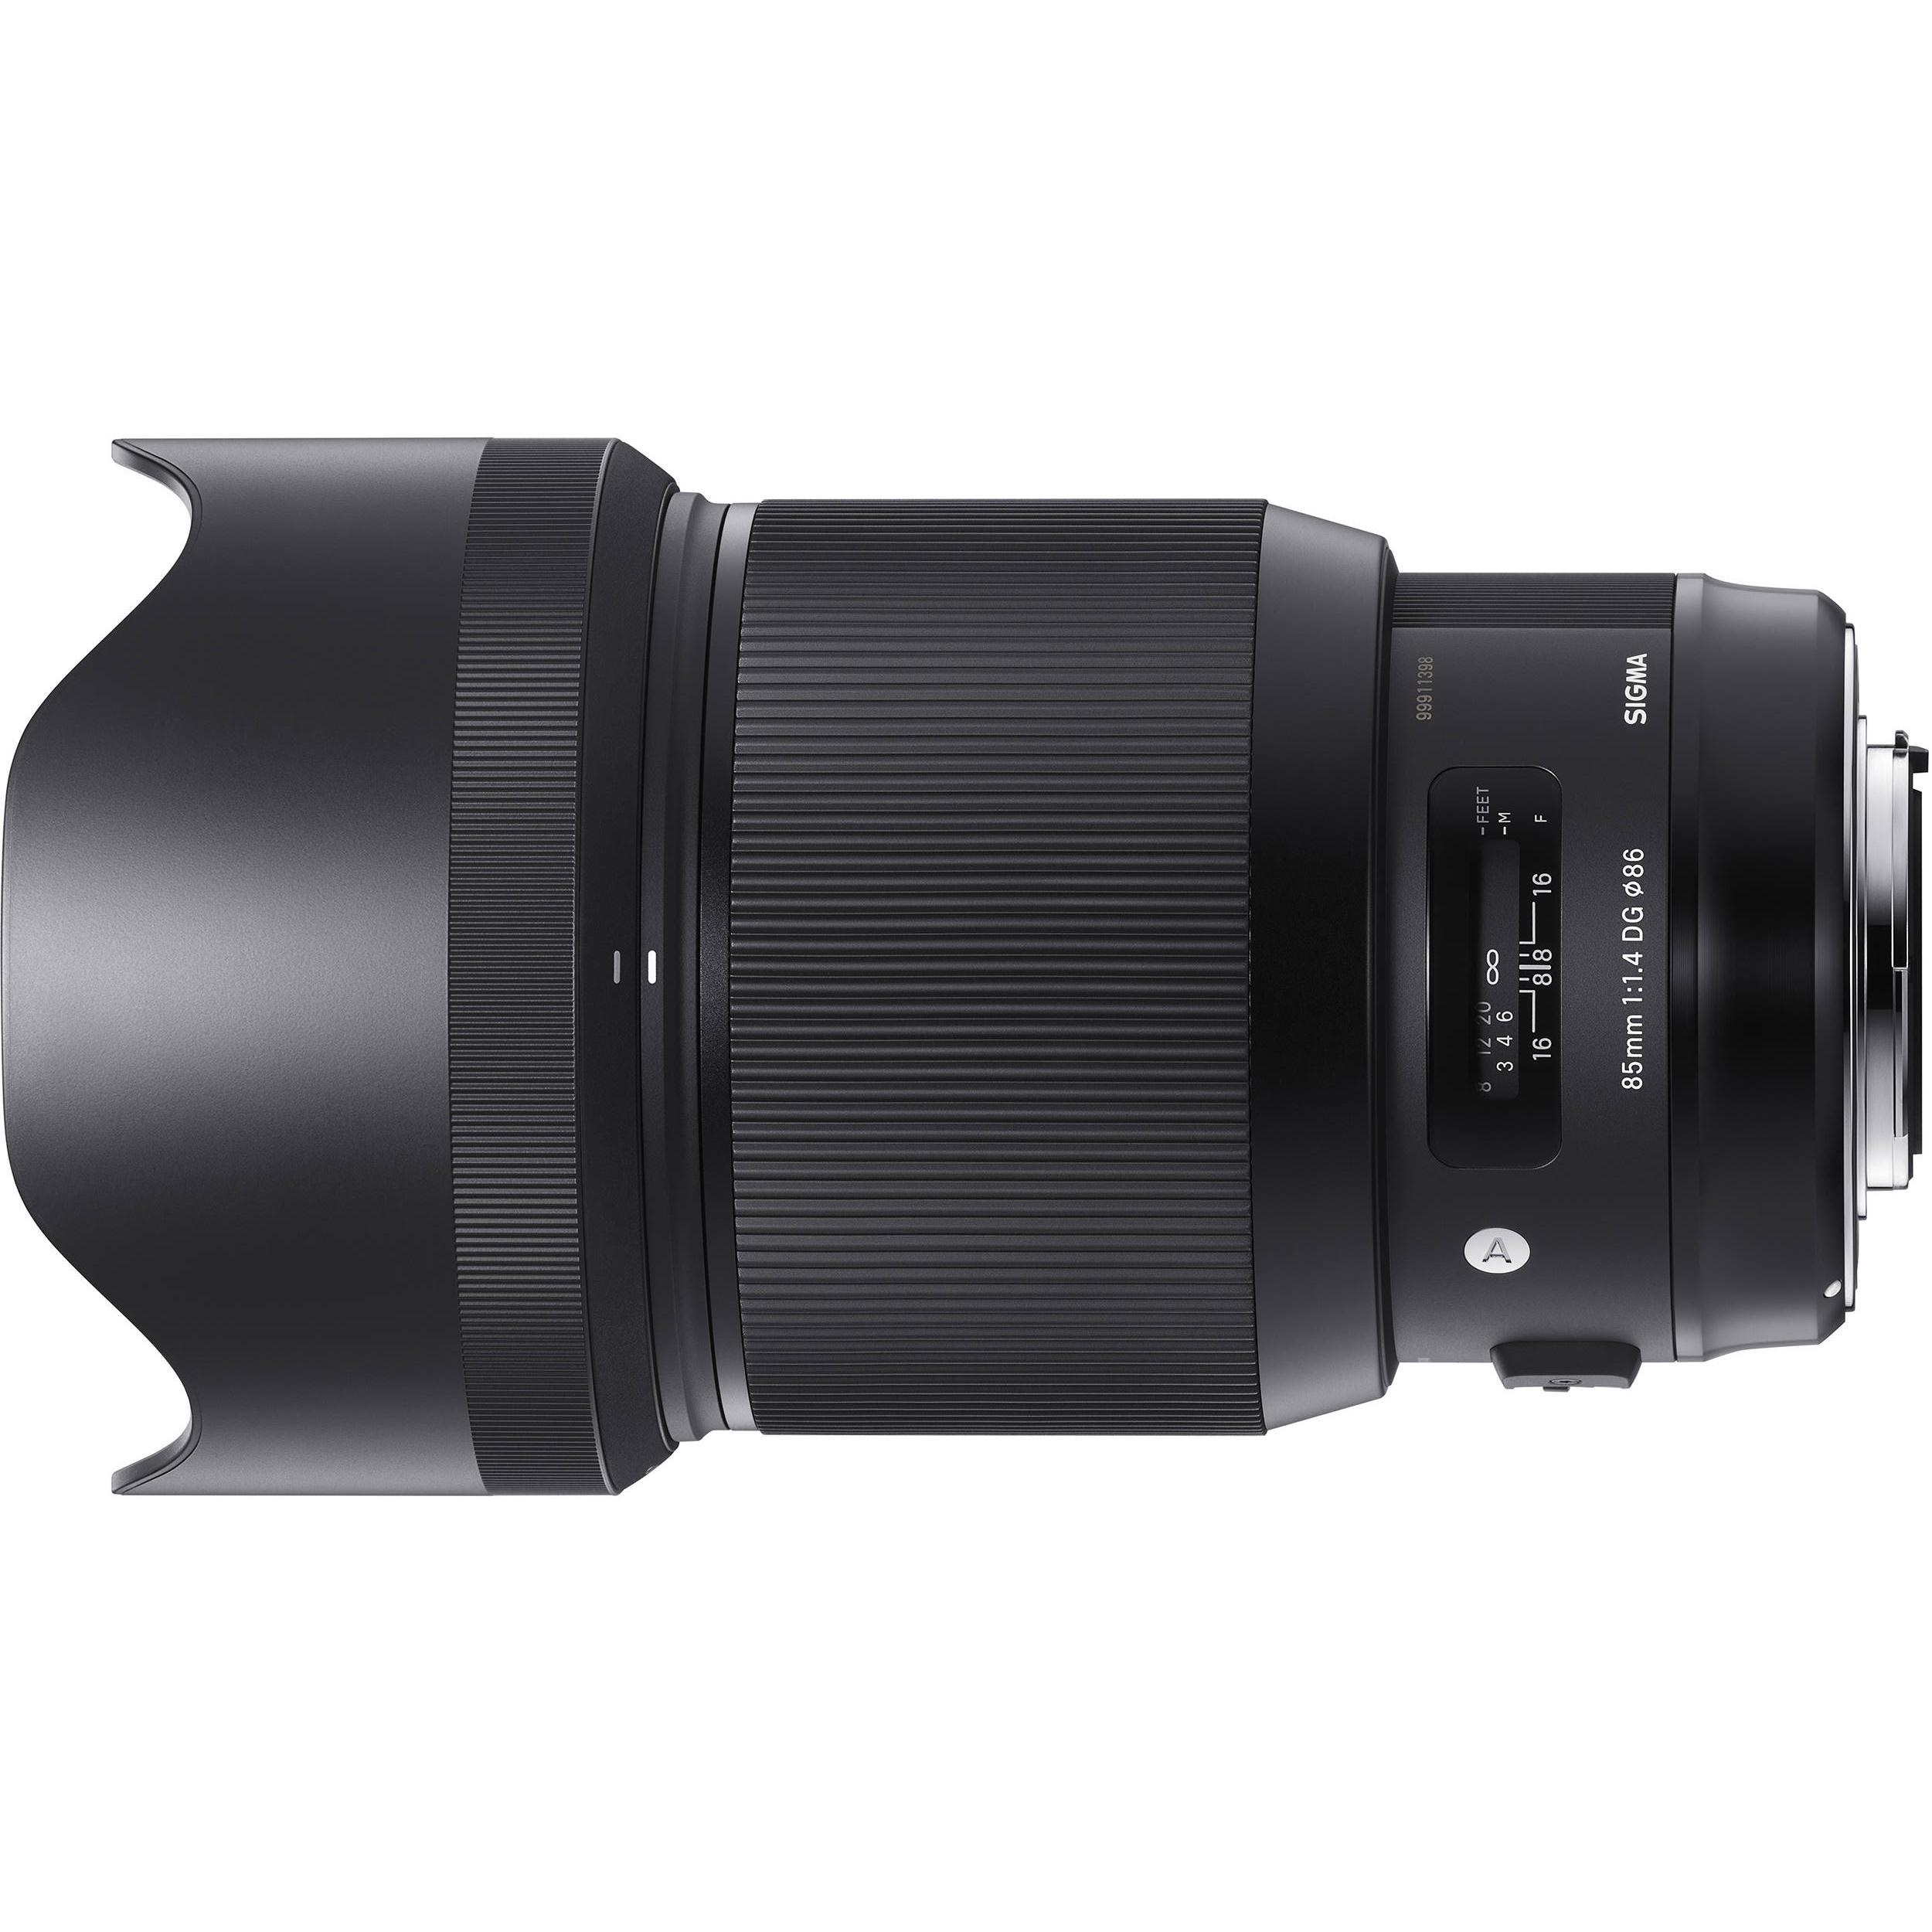 The Sigma ART 85mm f/1.4